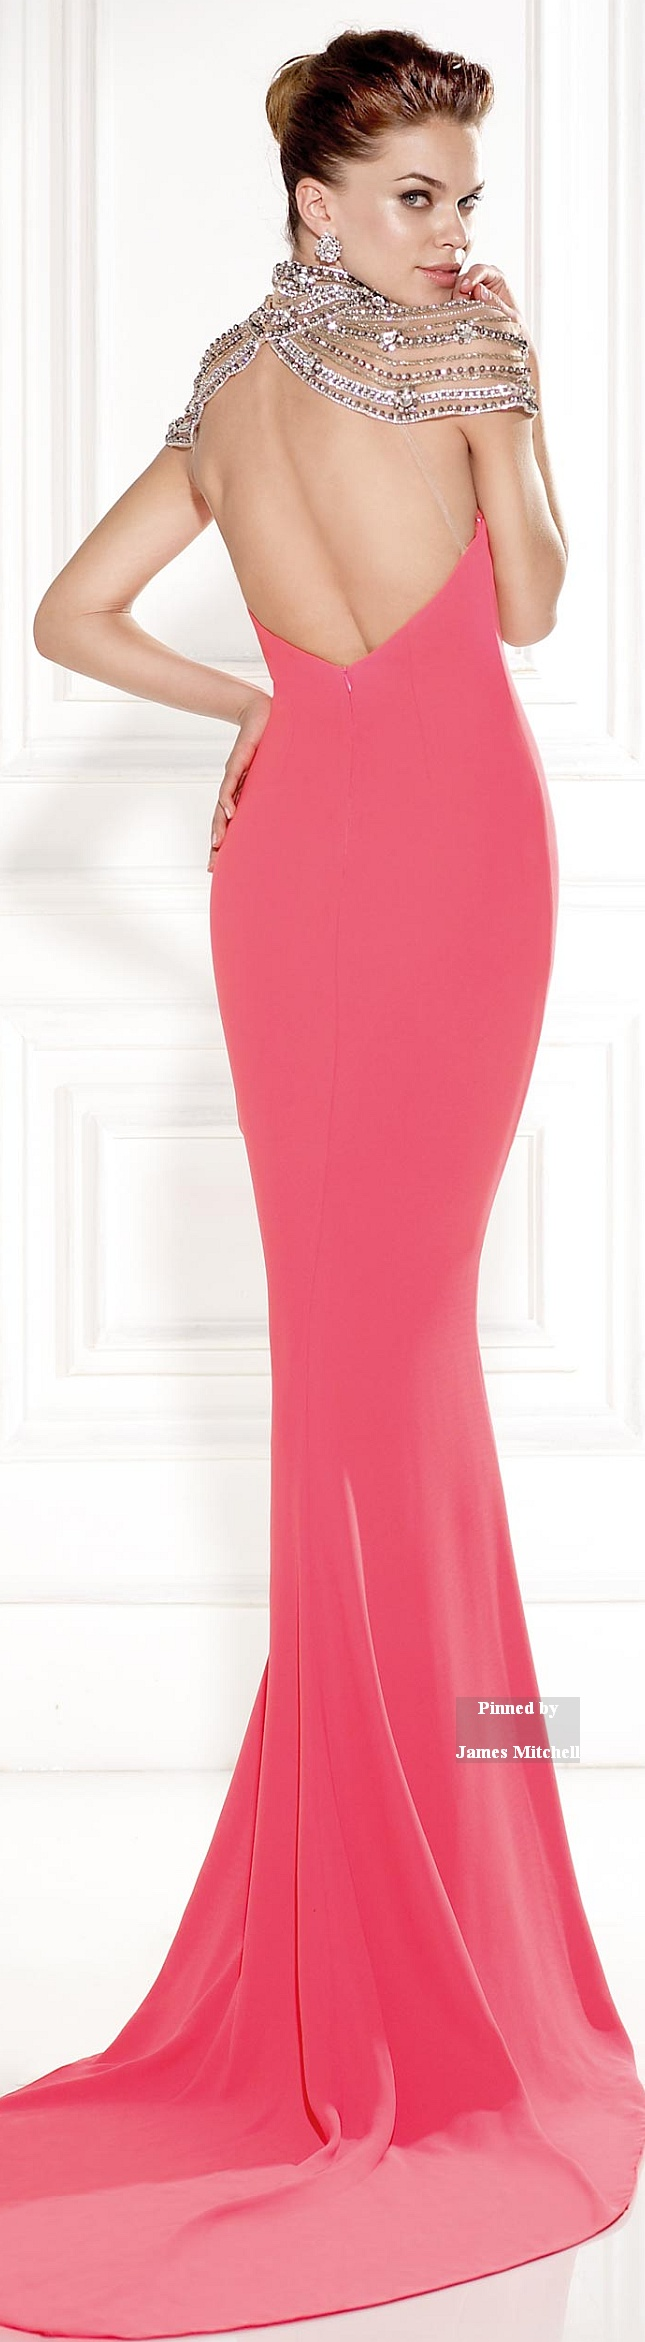 Tarik Ediz Collection 2015 | Vestido coctel | Pinterest | Gowns ...